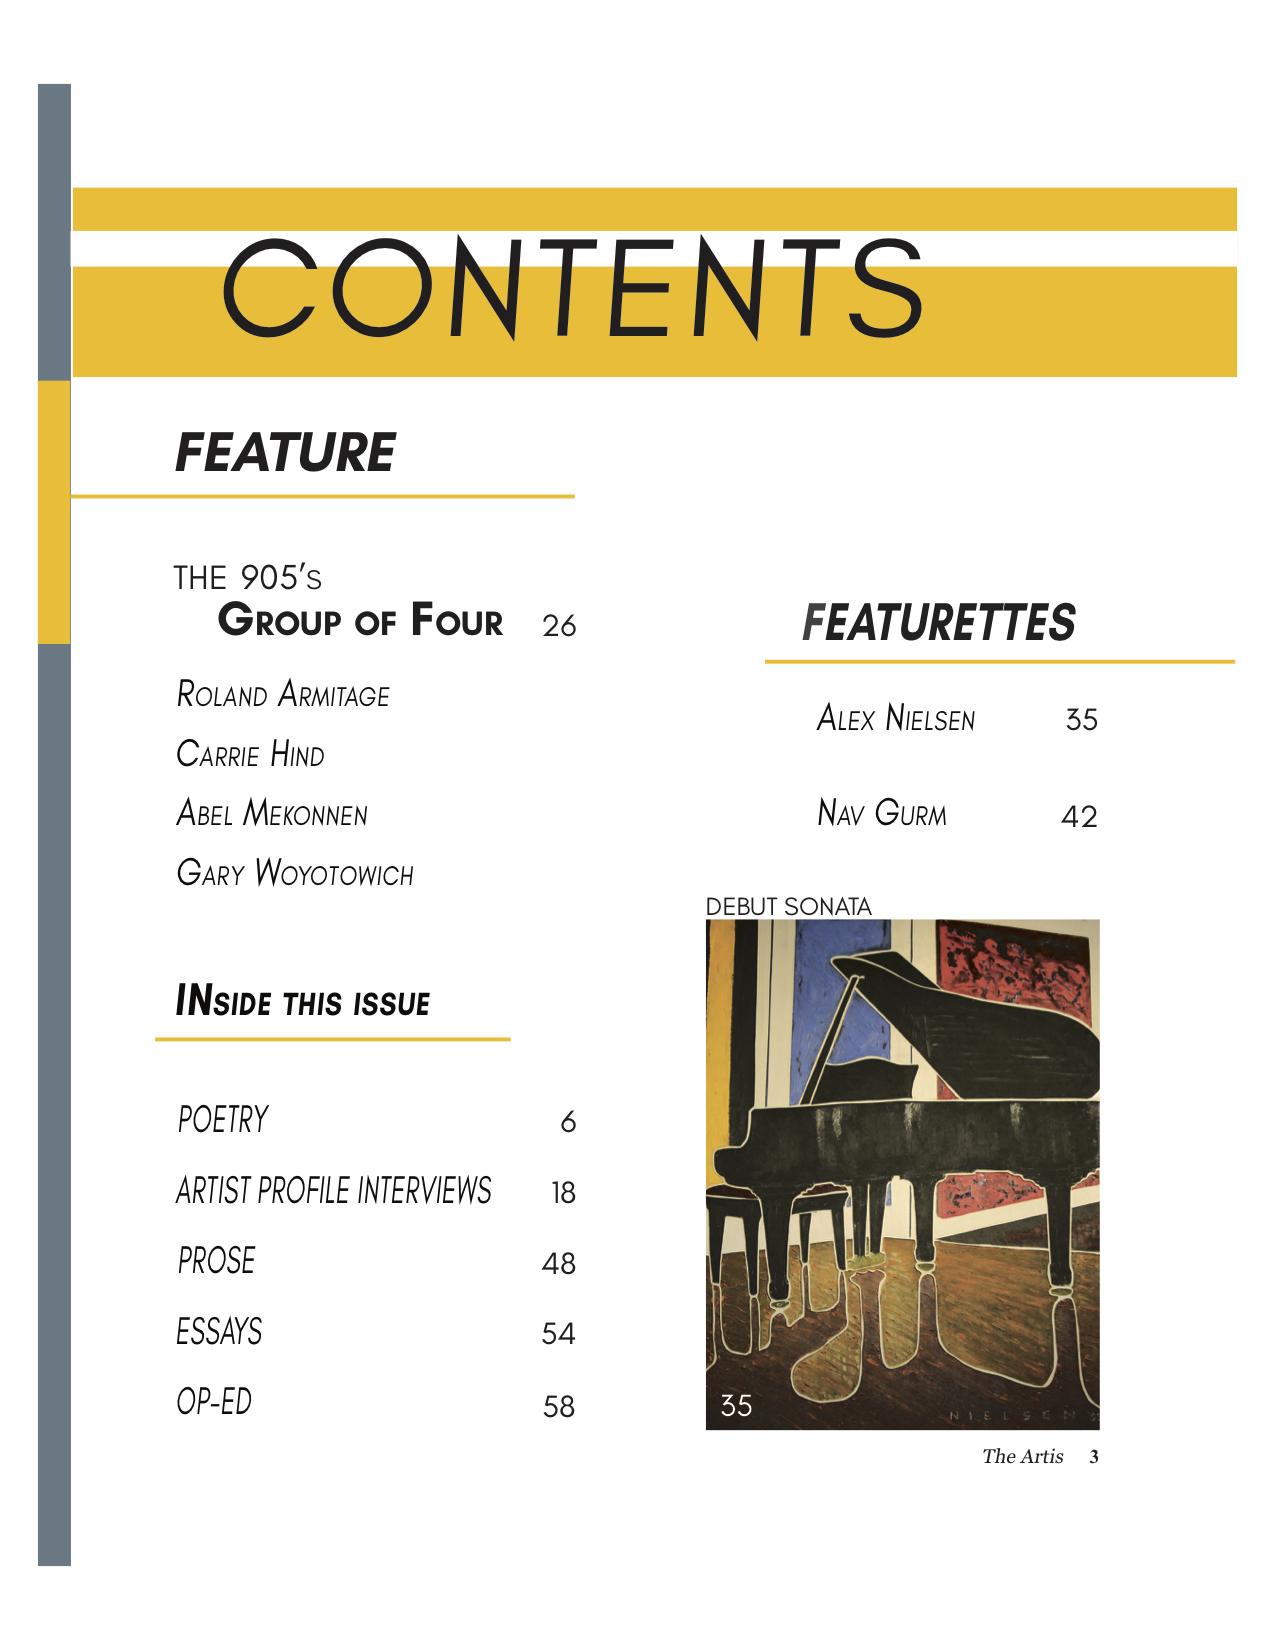 Artis 3 contents 1.jpg